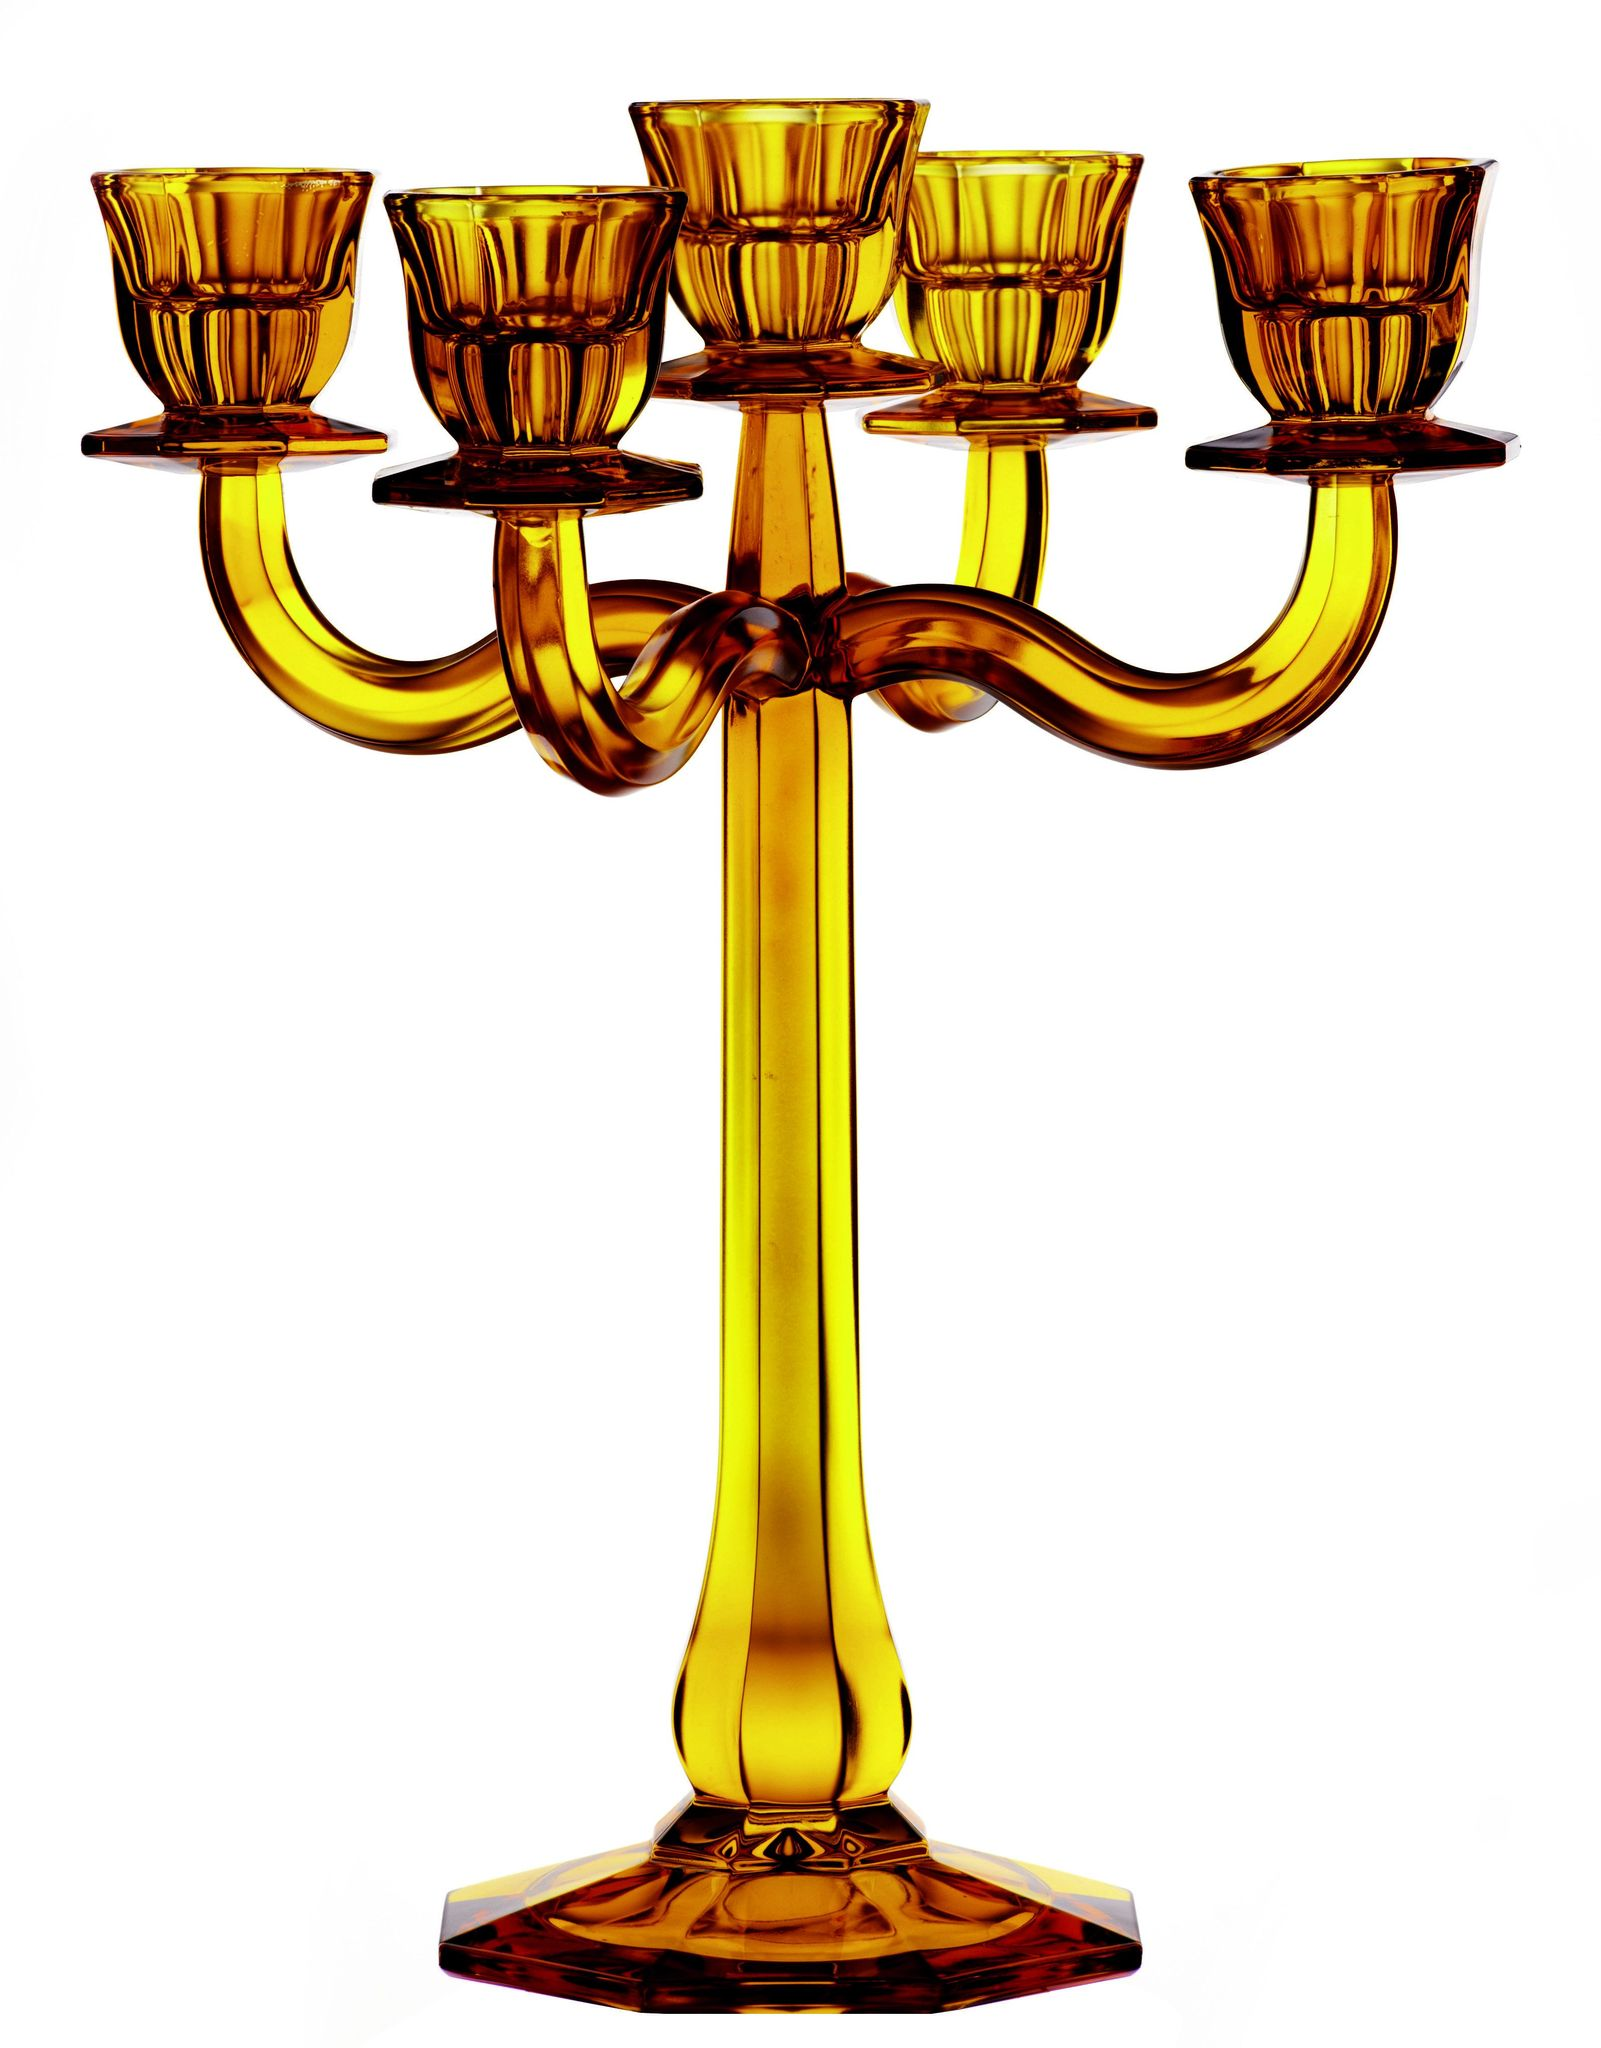 Подсвечники Подсвечник-канделябр 5 свечей Nachtmann Ravello желтый podsvechnik-kandelyabr-5-svechey-nachtmann-ravello-zheltyy-germaniya.jpg